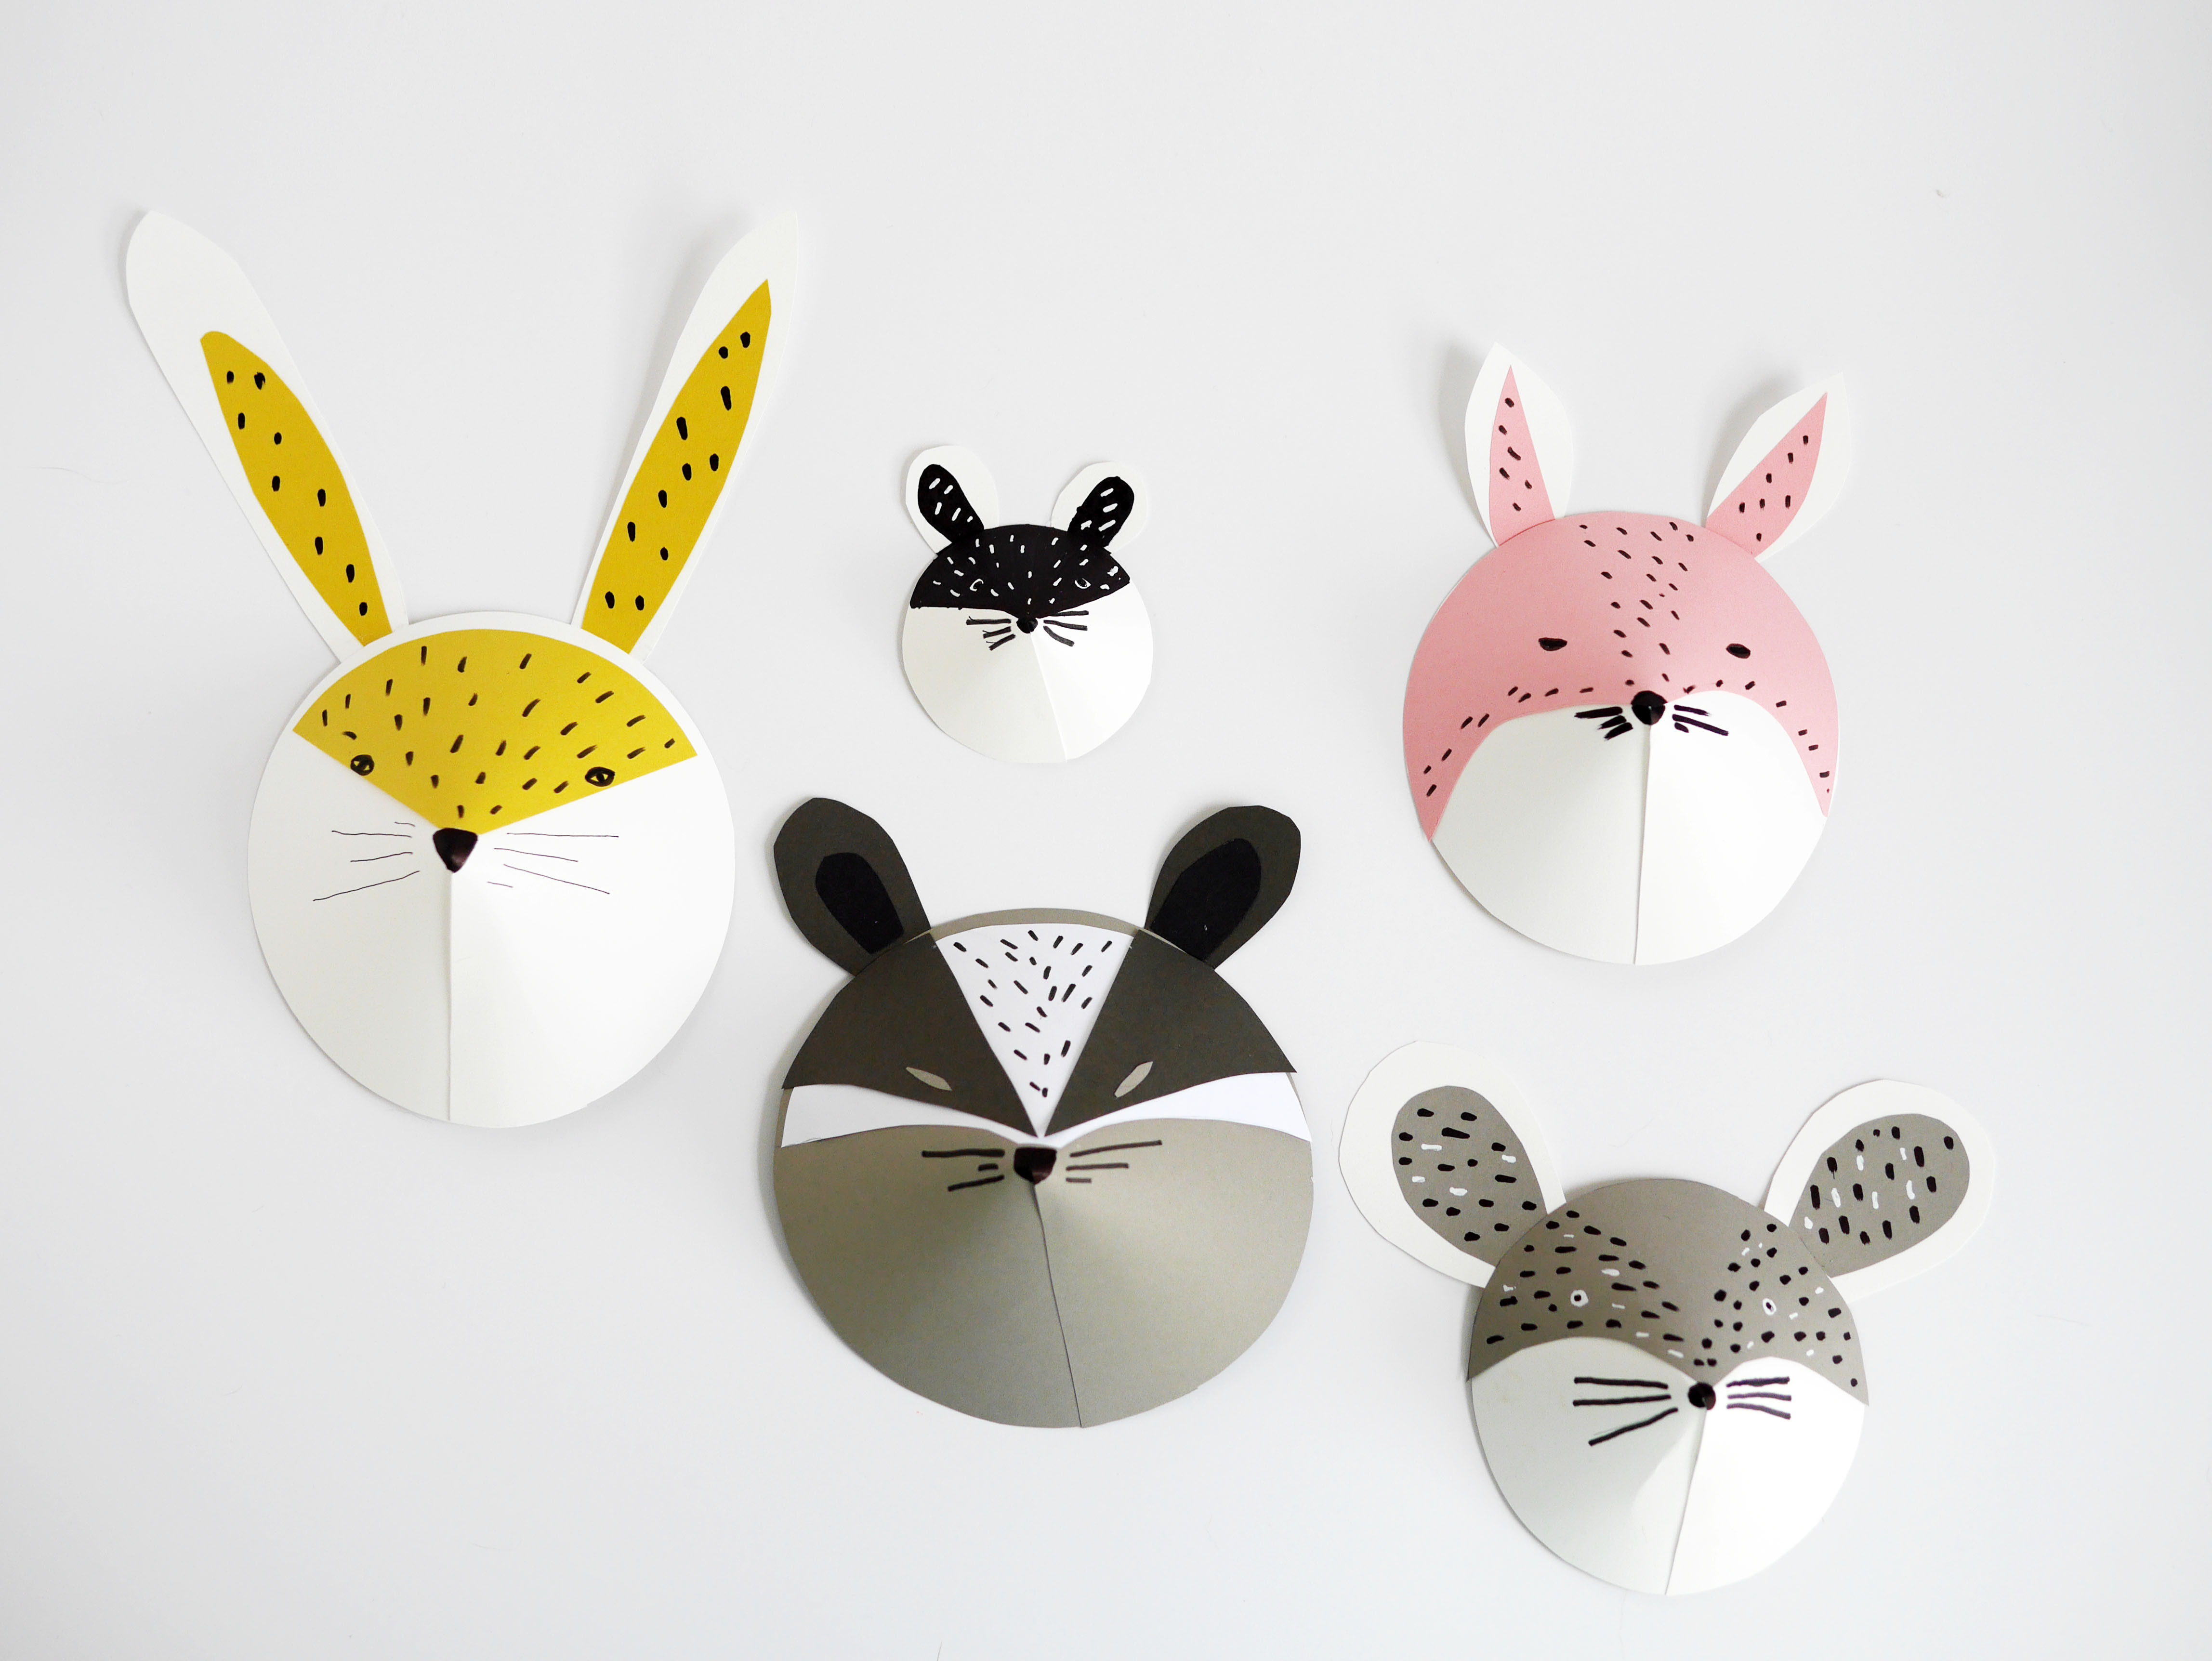 Best ideas about DIY Animal Masks . Save or Pin DIY animal paper masks by La maison de Loulou 2 Now.